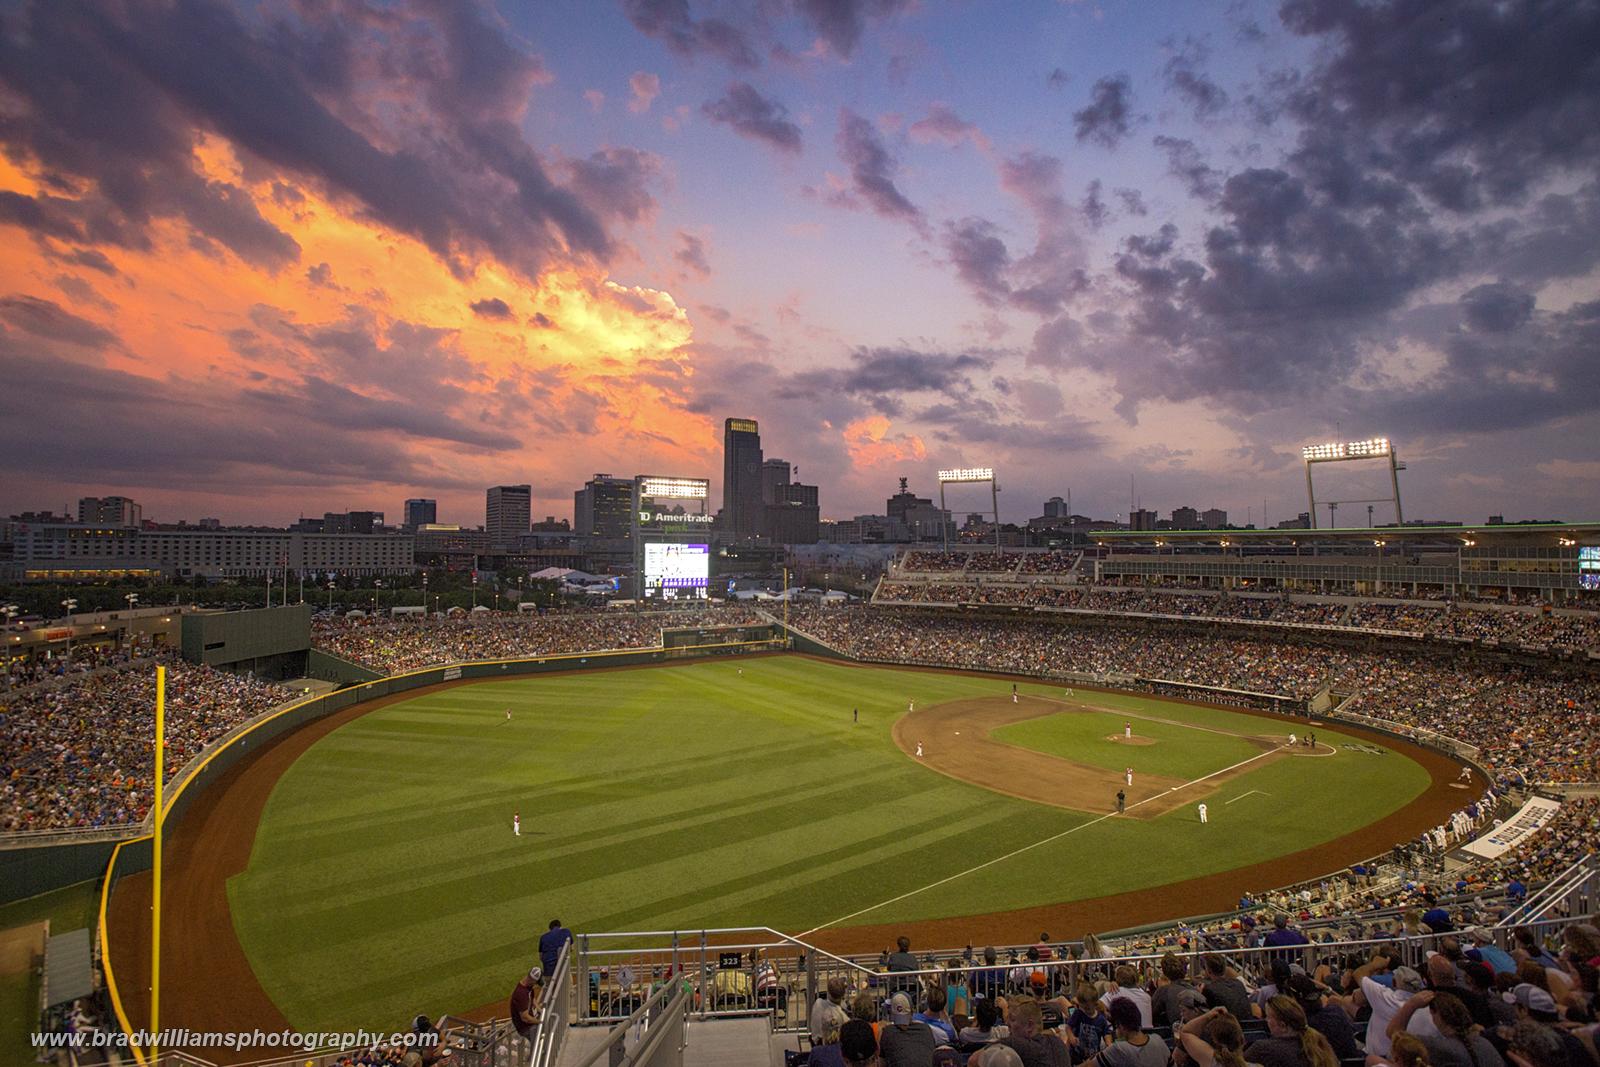 TD Ameritrade Park, Omaha, Nebraska, baseball, thunder storm, photo